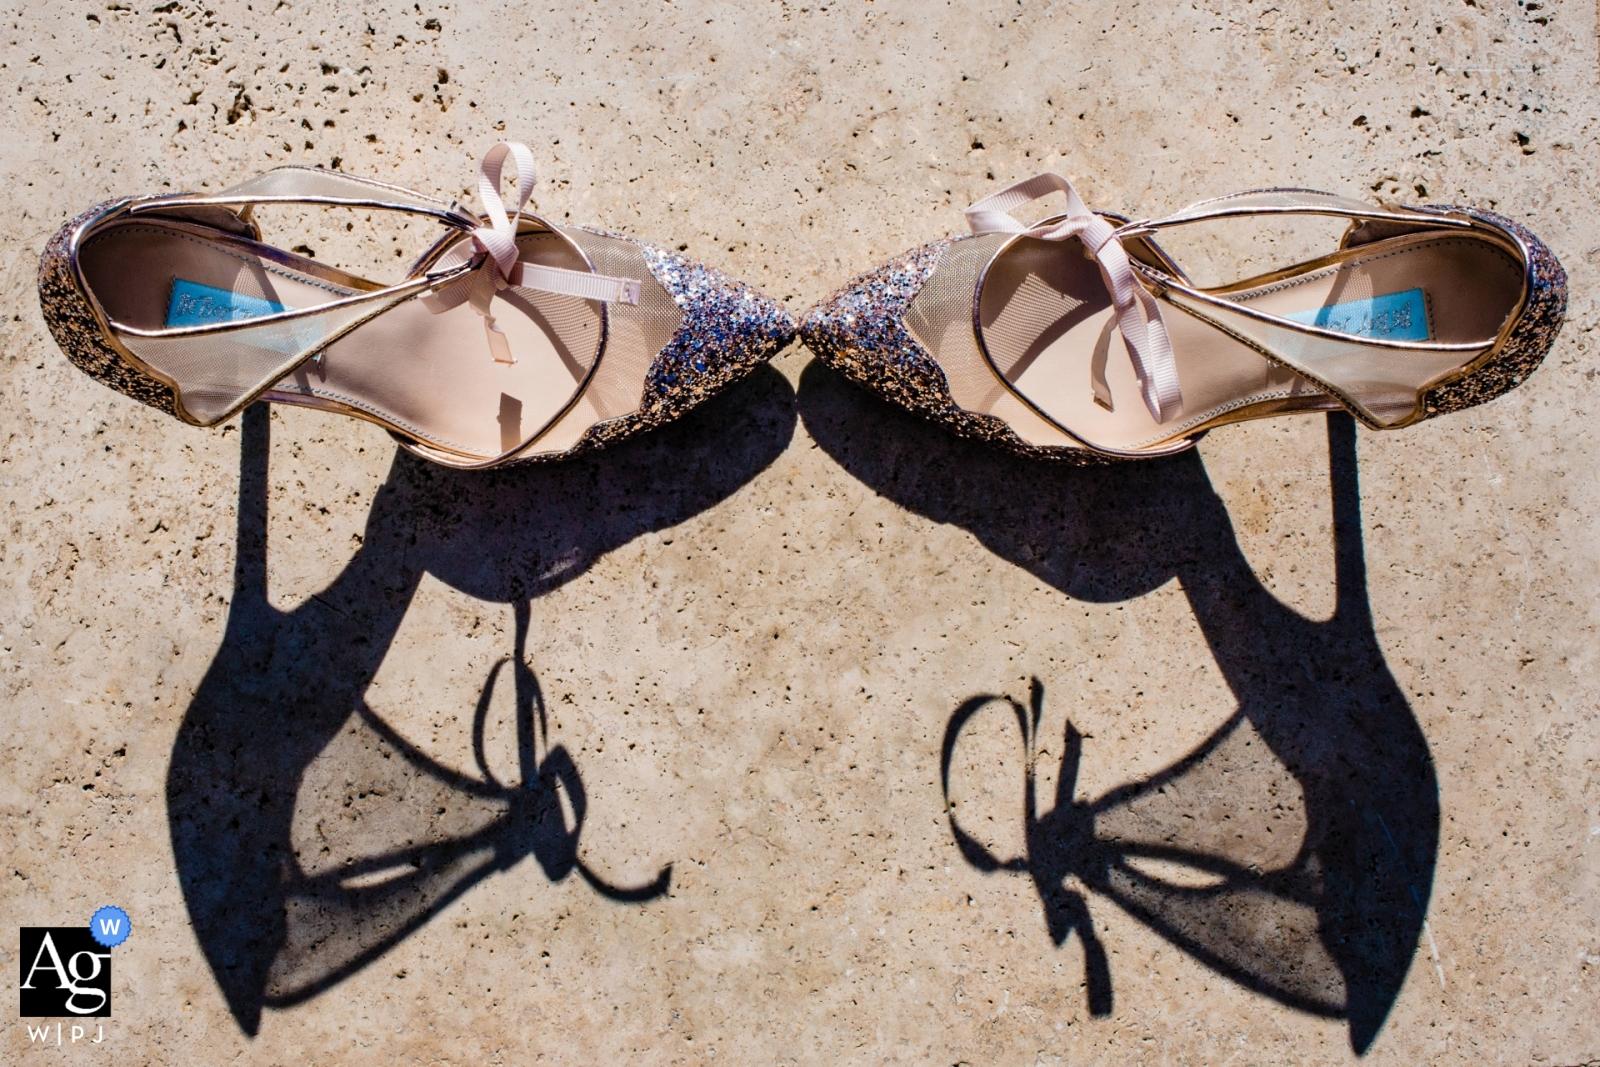 Tanya Parada is an artistic wedding photographer for California